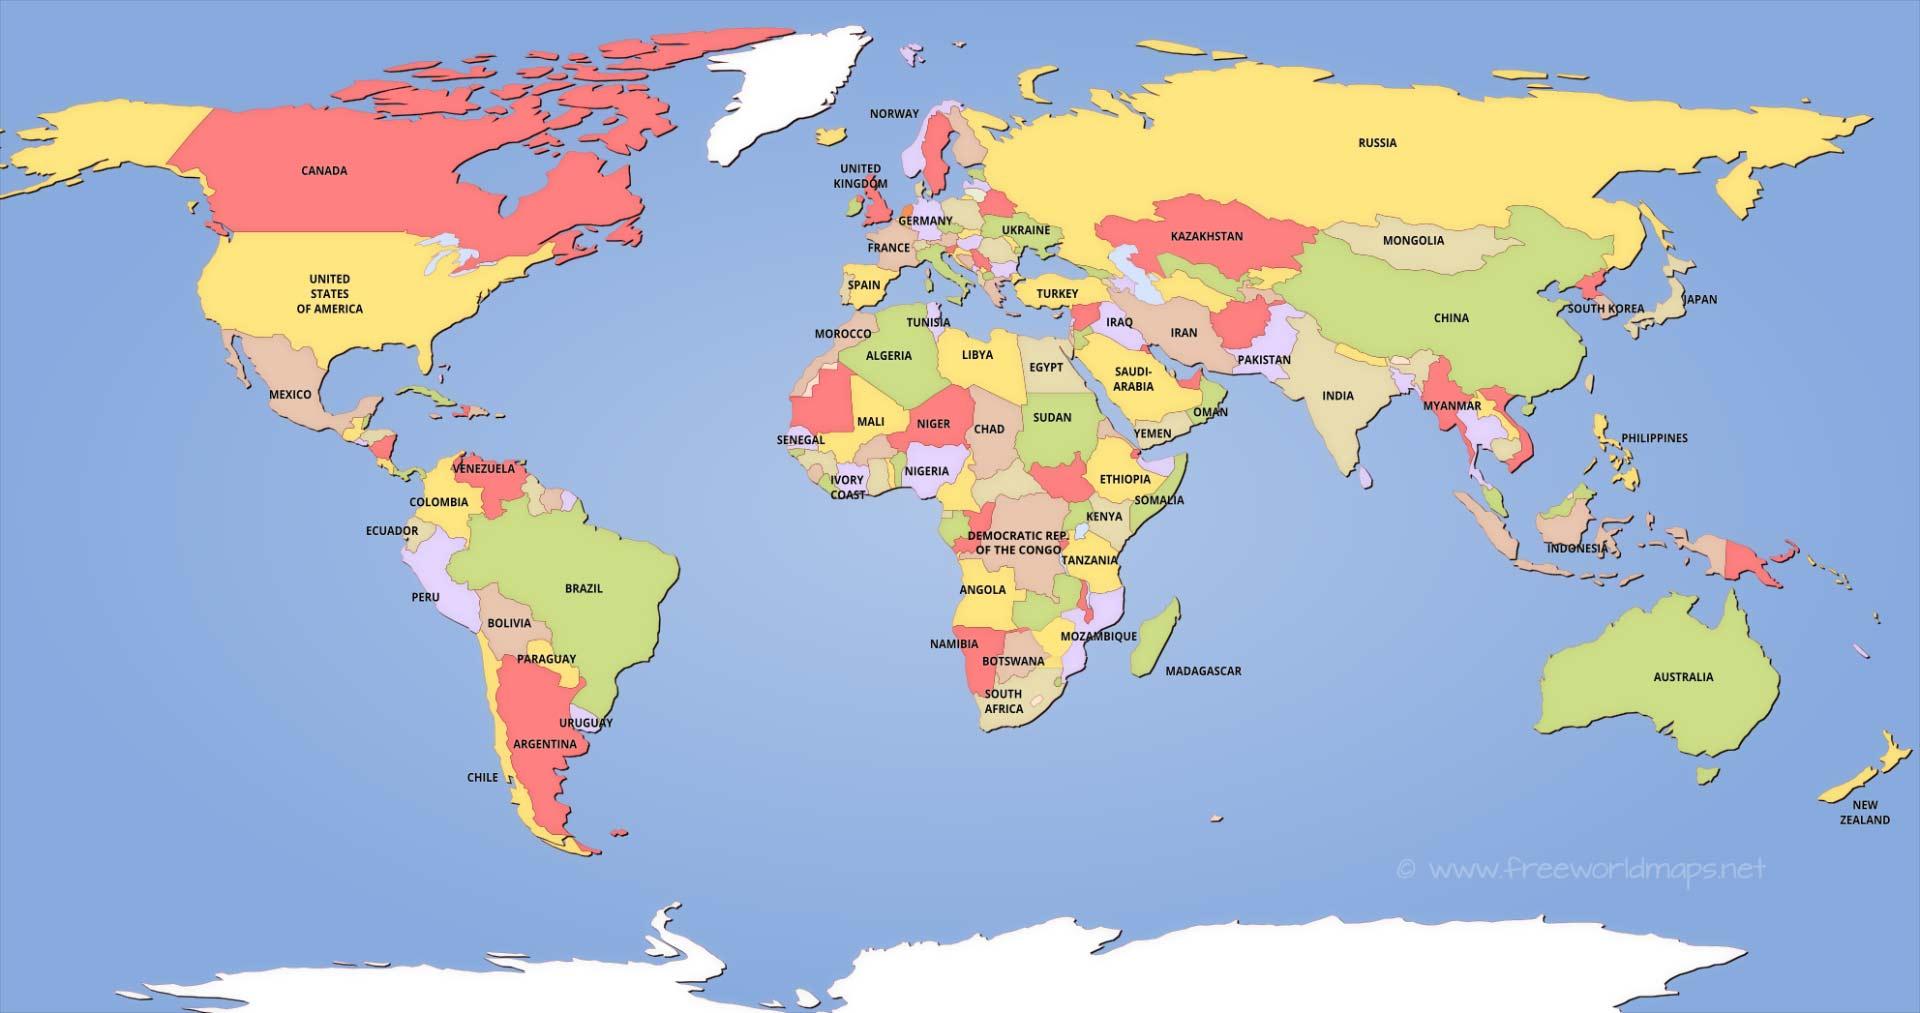 bioplastics news per country